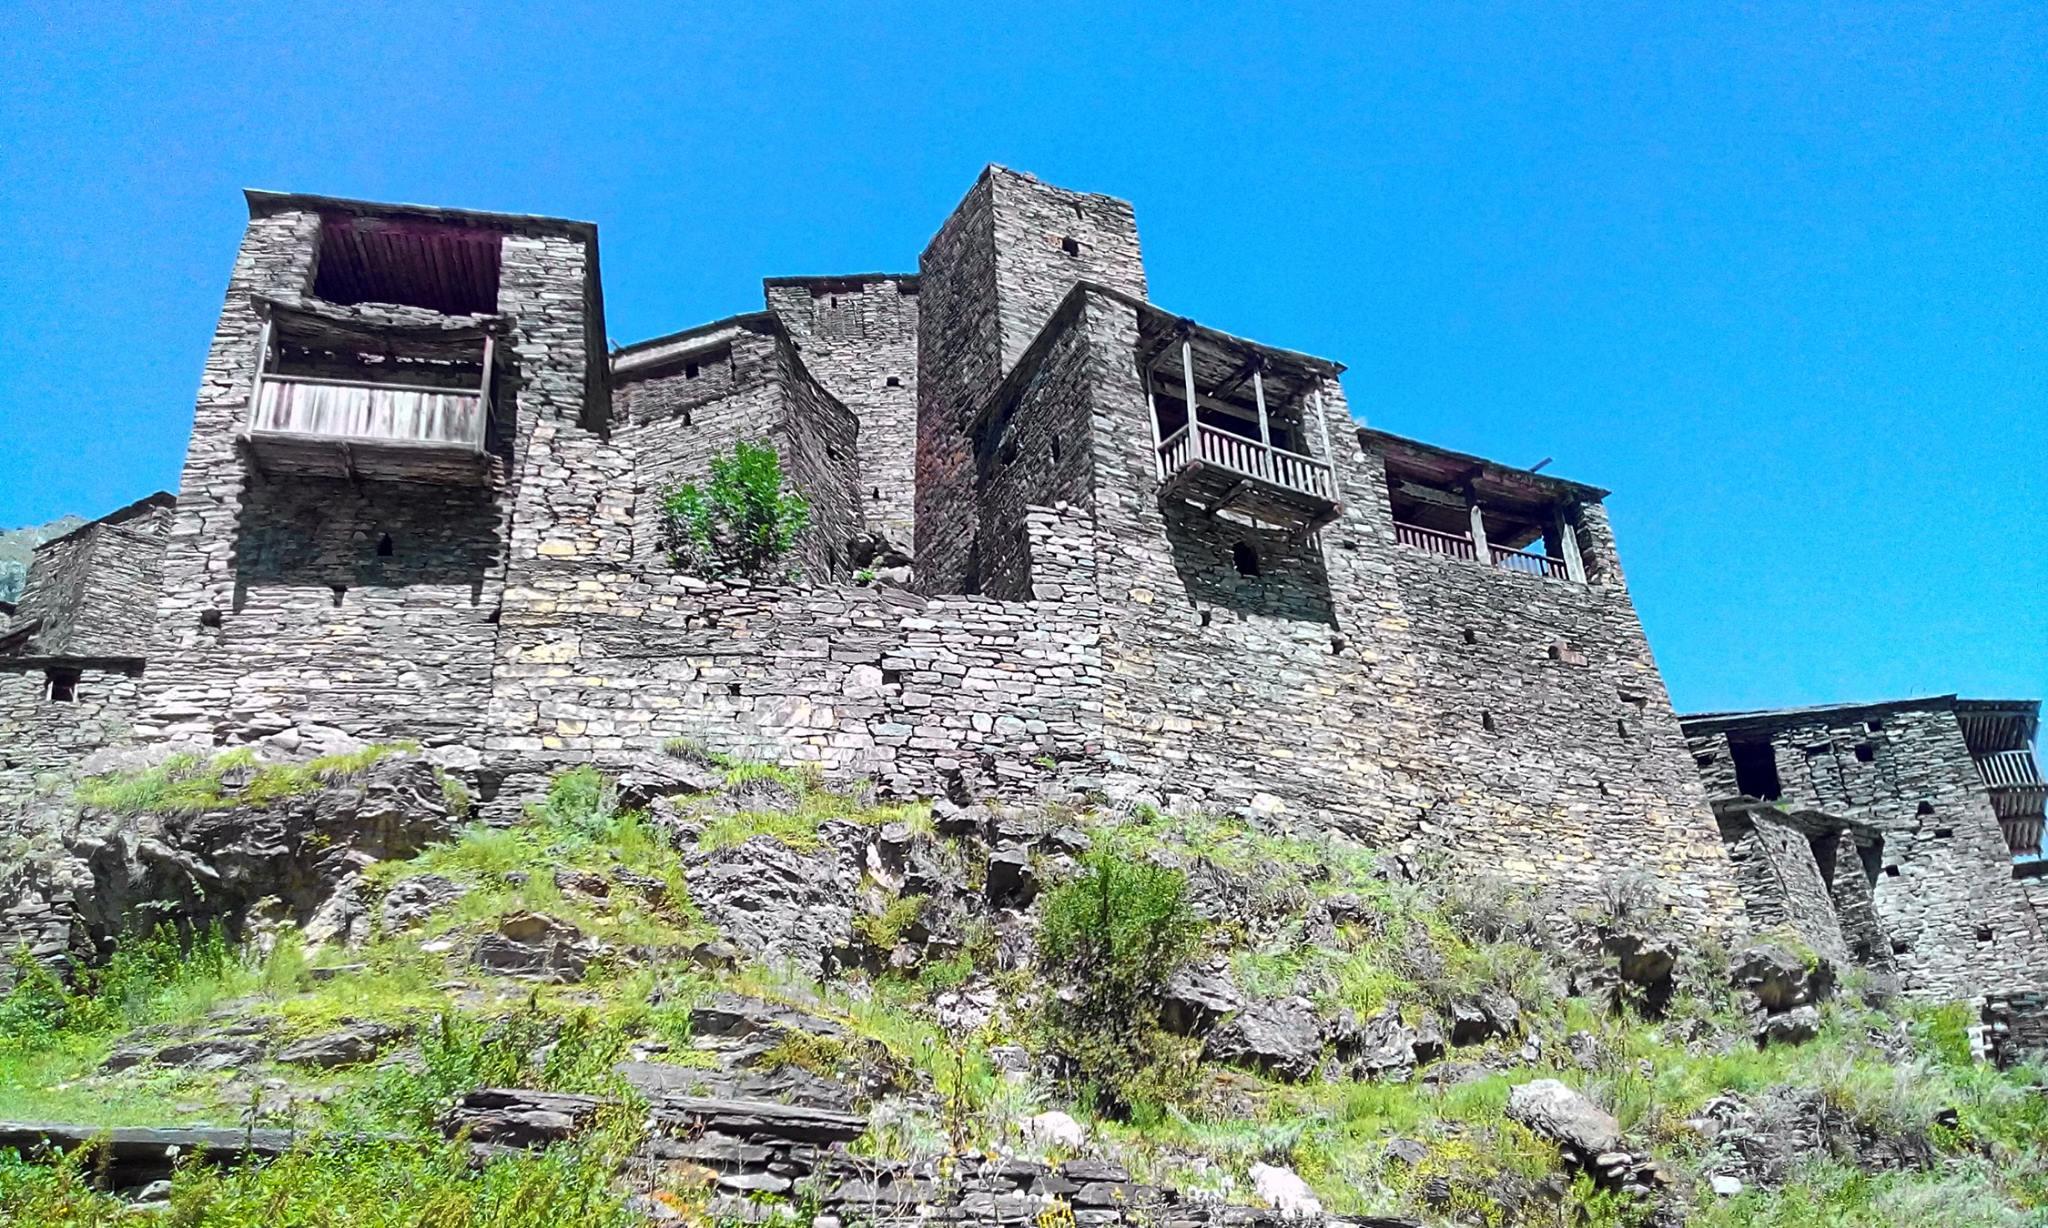 Фотографии крепости Шатили